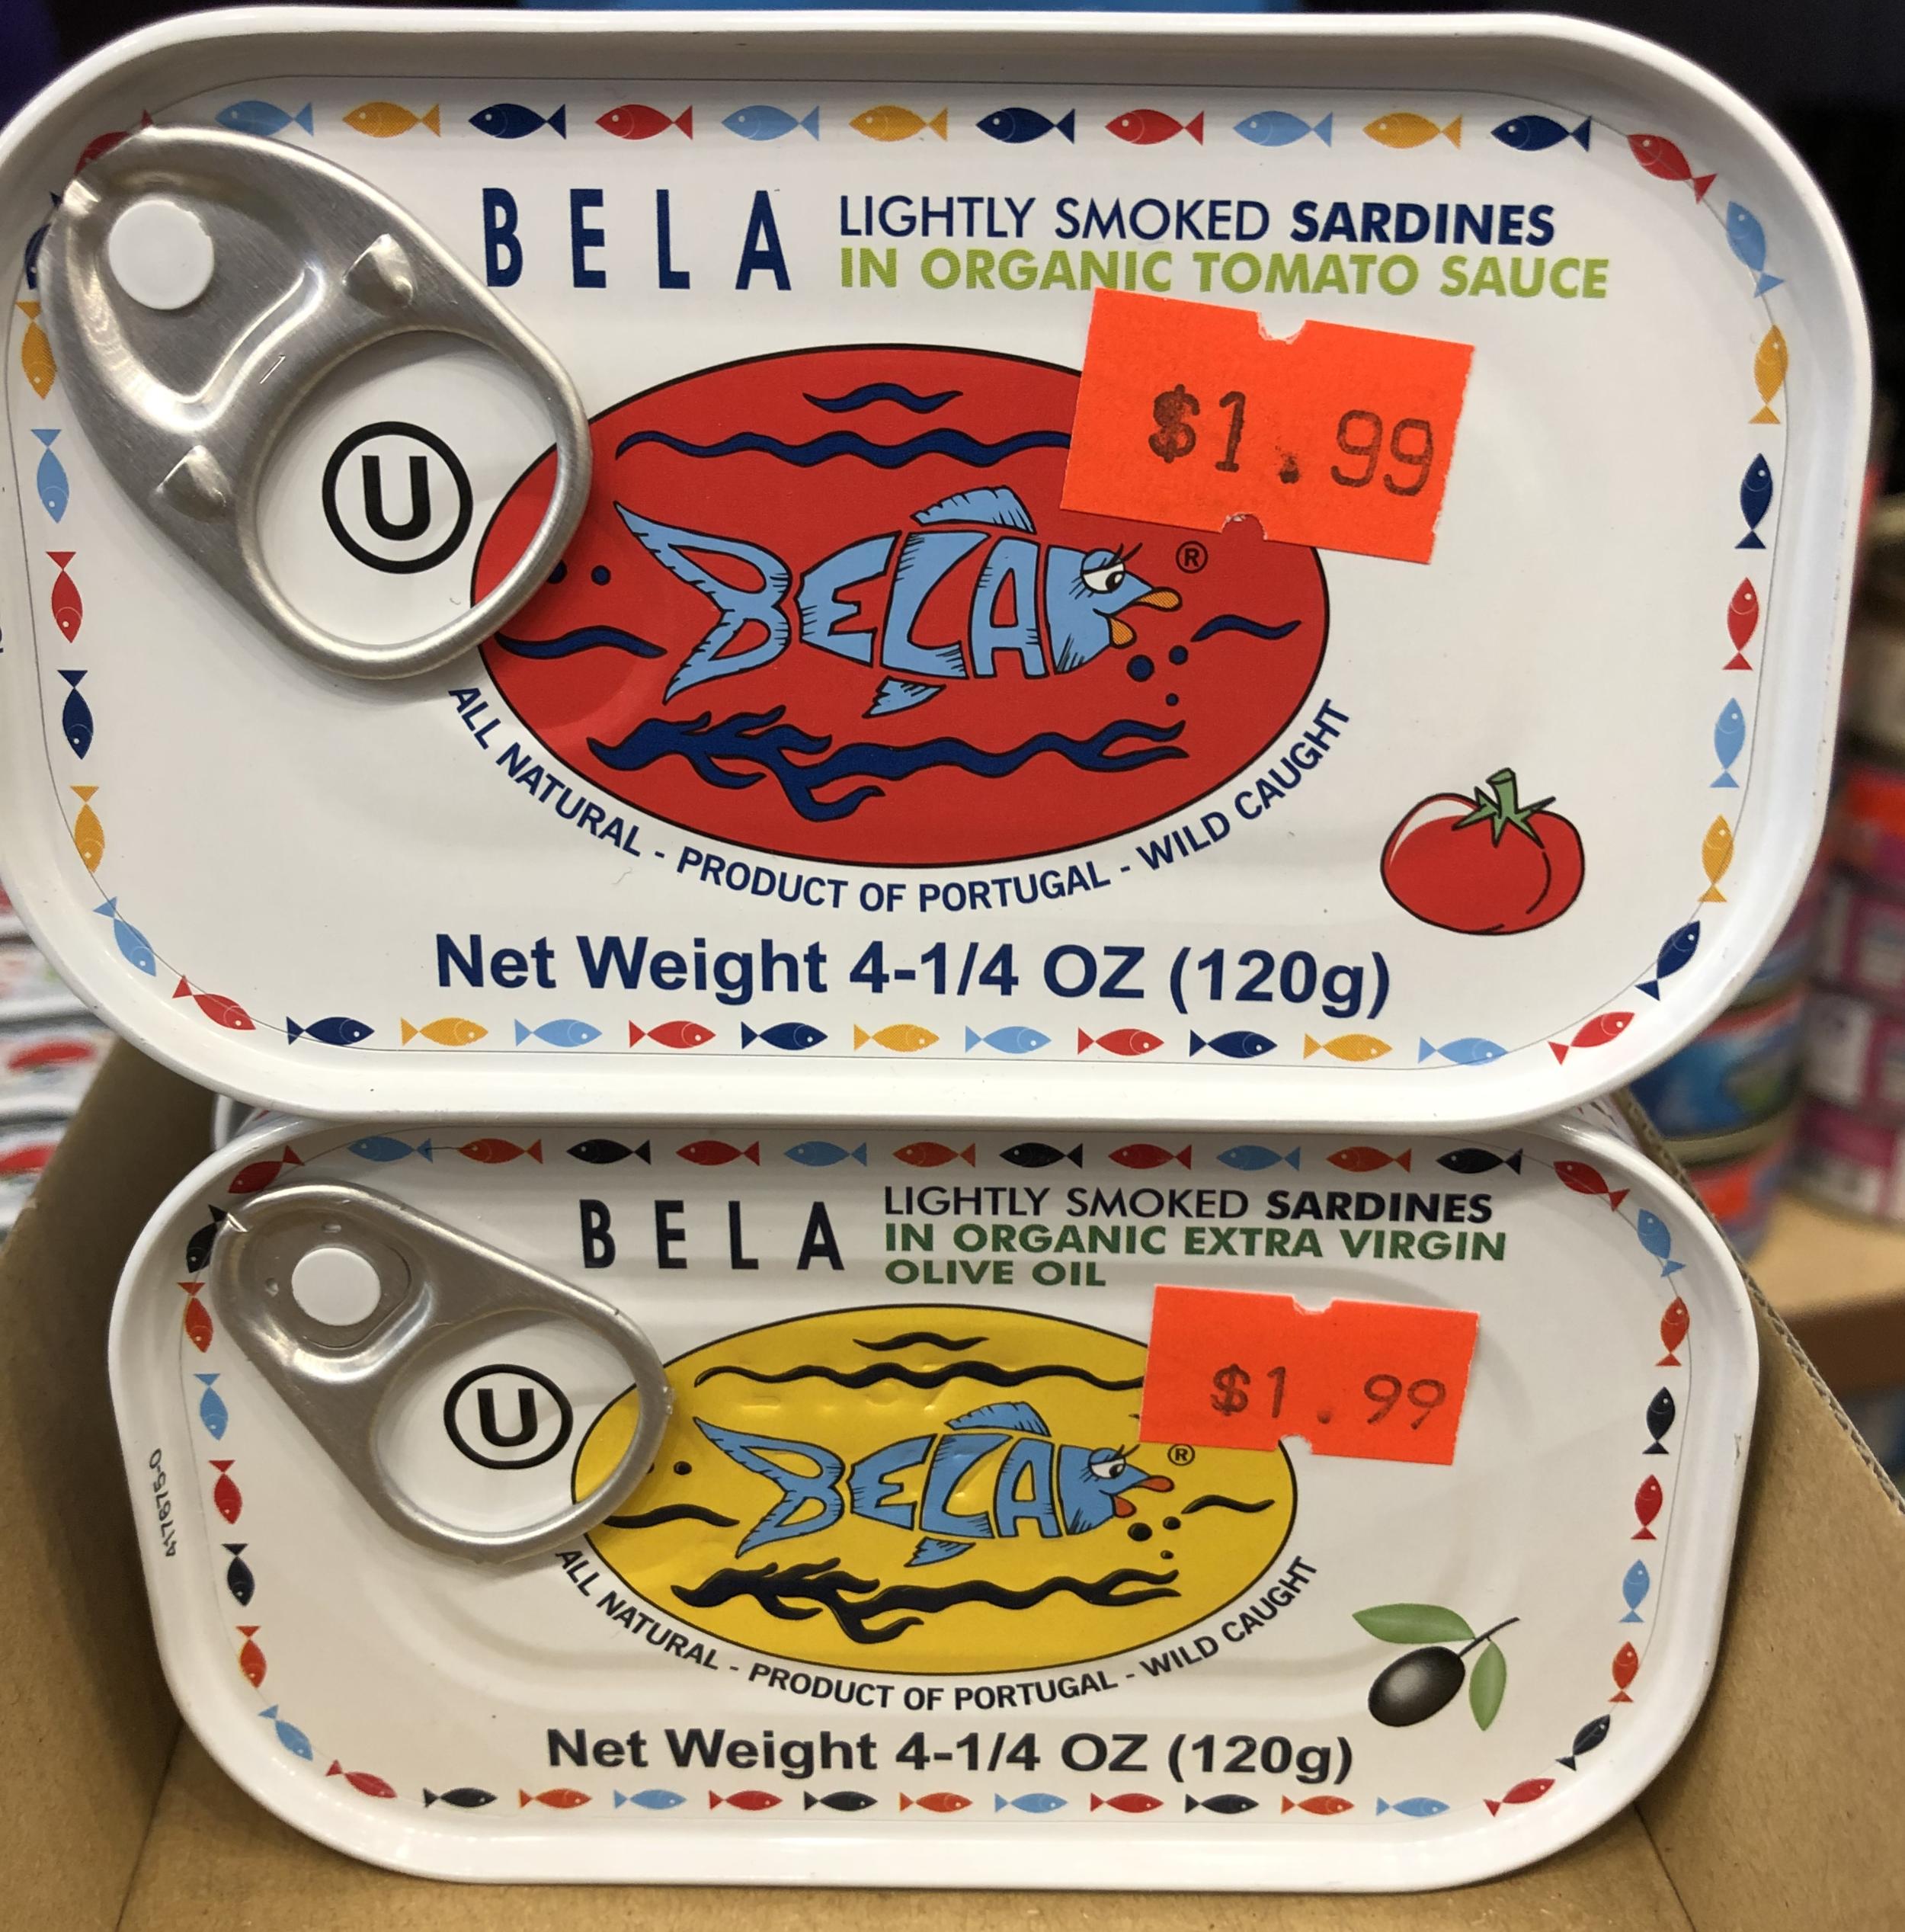 Bela Lightly Smoked Sardines in Organic - Tomato Sauce & Extra Virgin Olive Oil